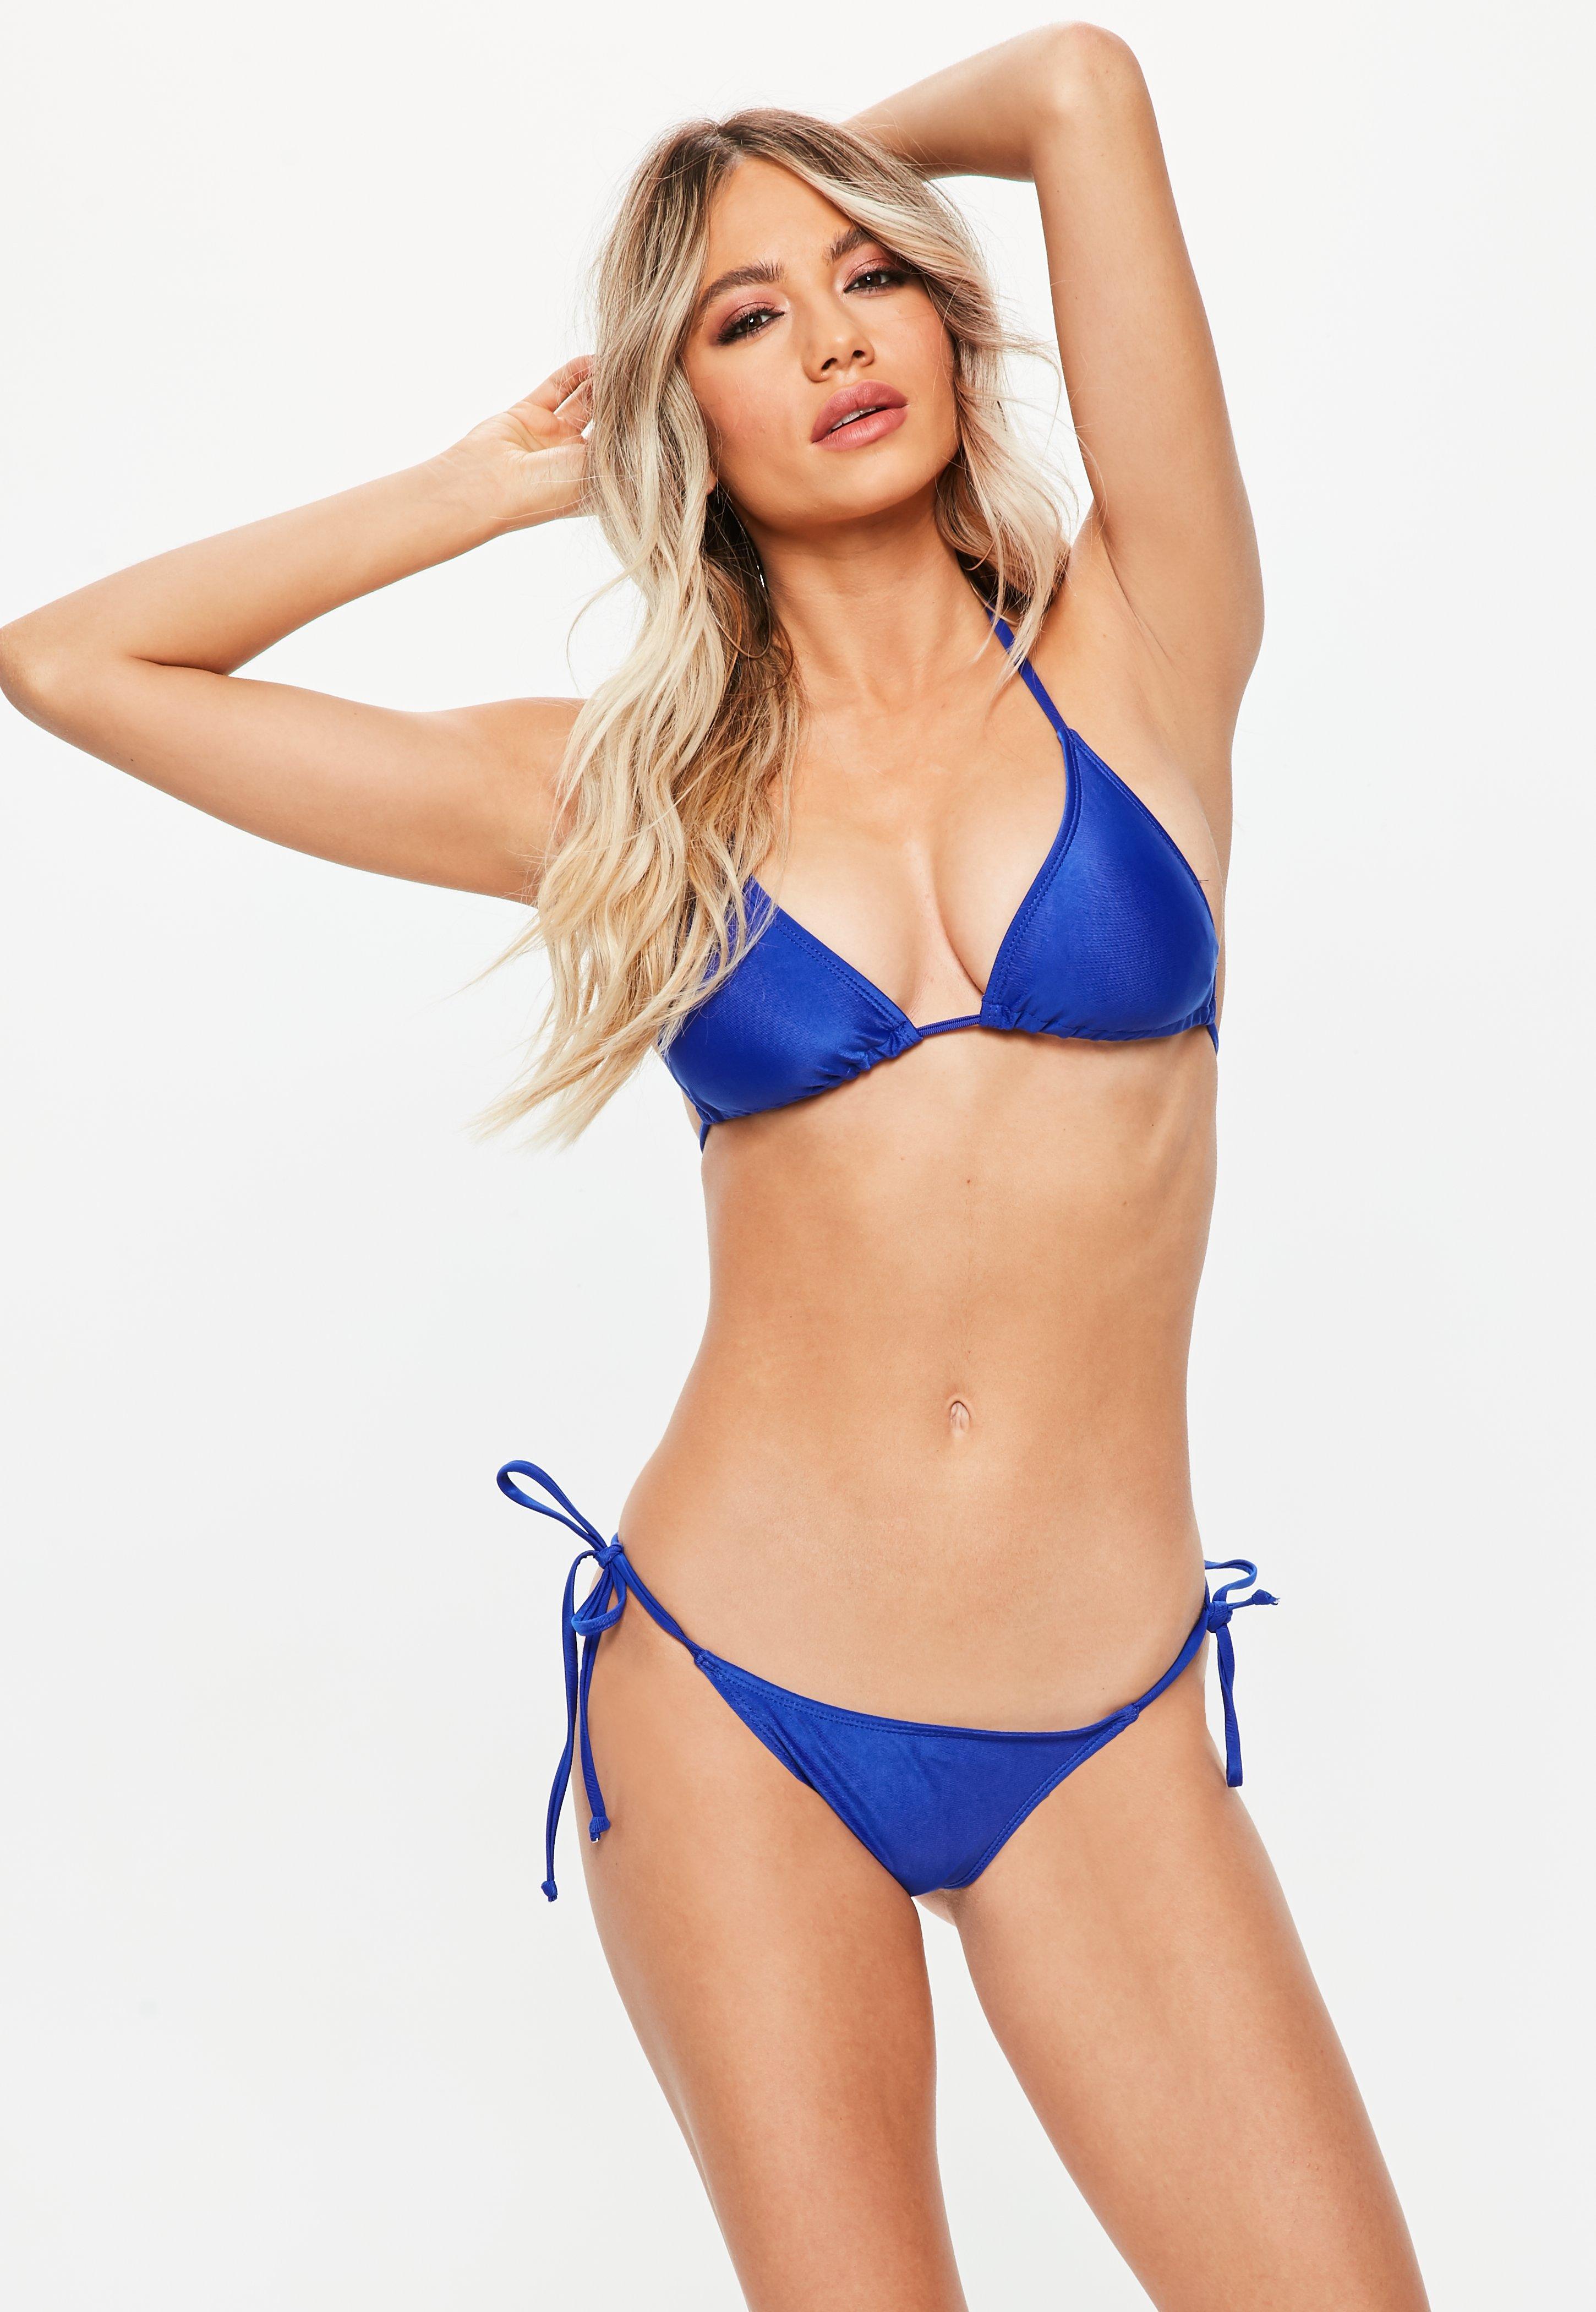 Bikini Swimsuit Pics